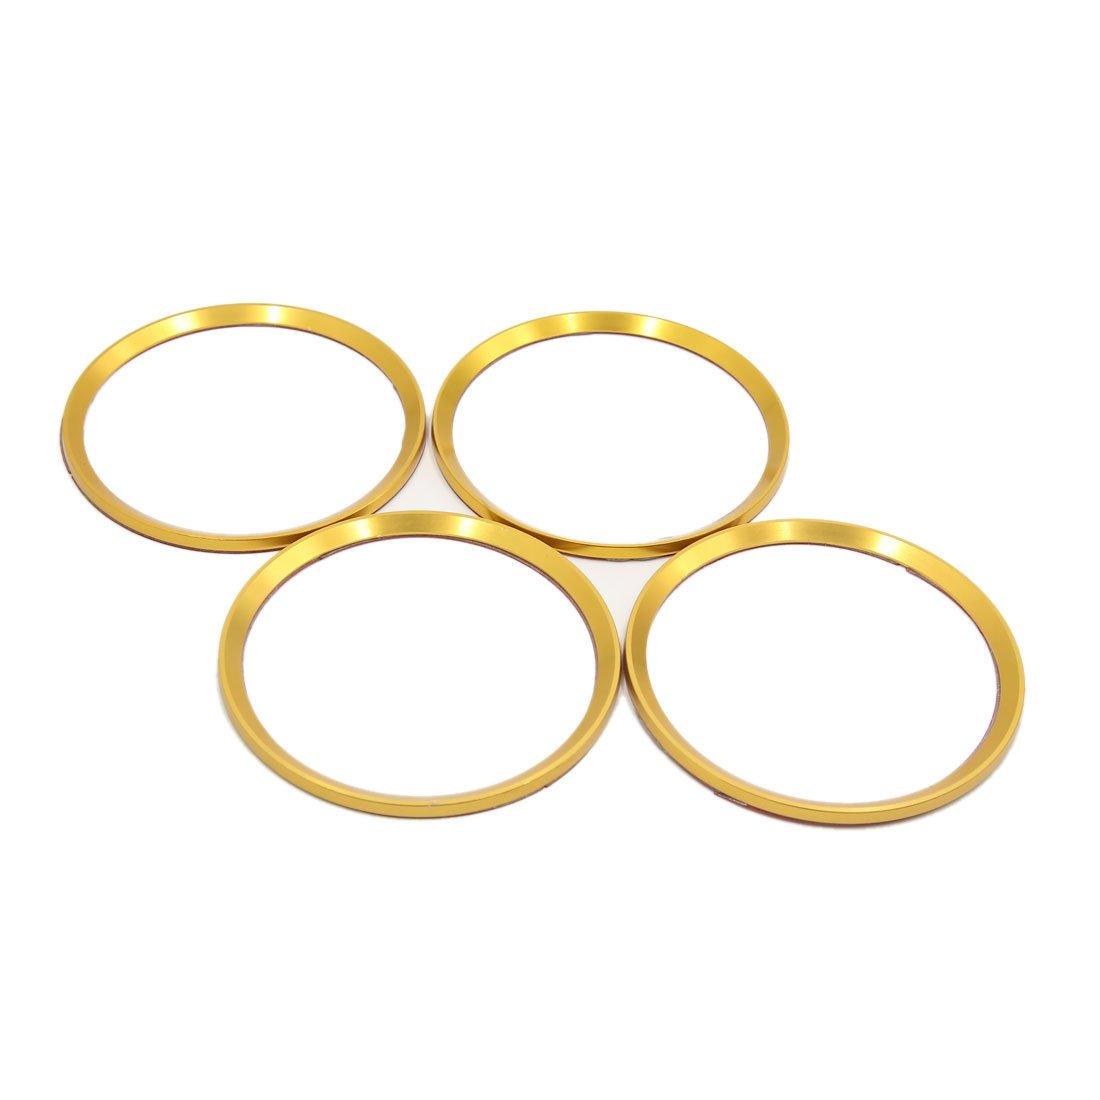 uxcell 4pcs Gola Tone Car Wheel Center Hub Emblem Decorative Trim Ring Circle for Cadillac XT5 XTS ATSL SRX